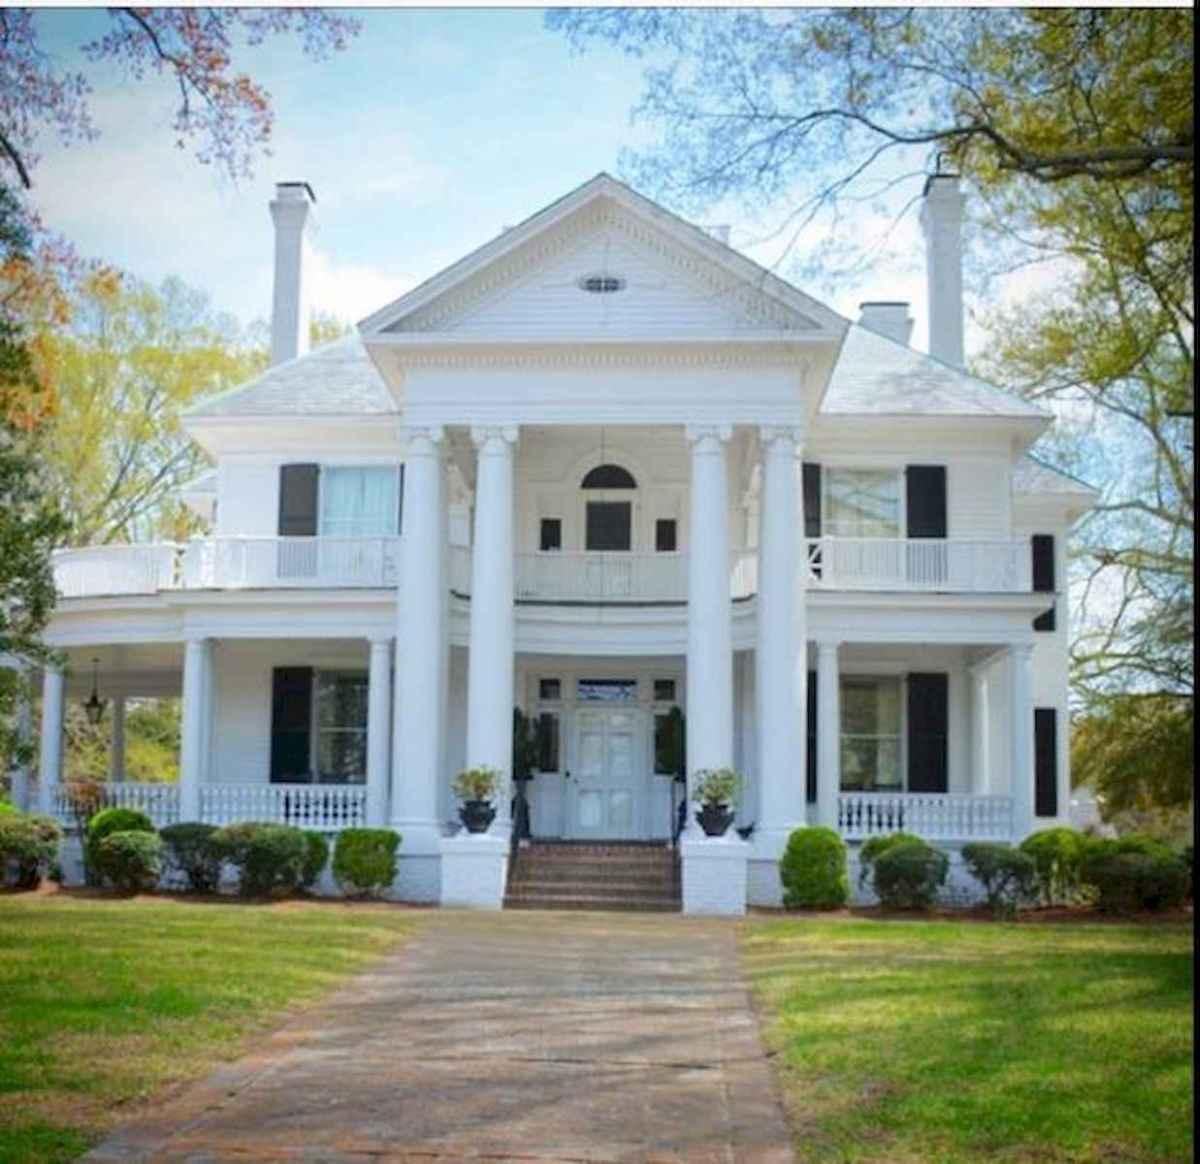 40 Stunning Mansions Luxury Exterior Design Ideas (32)